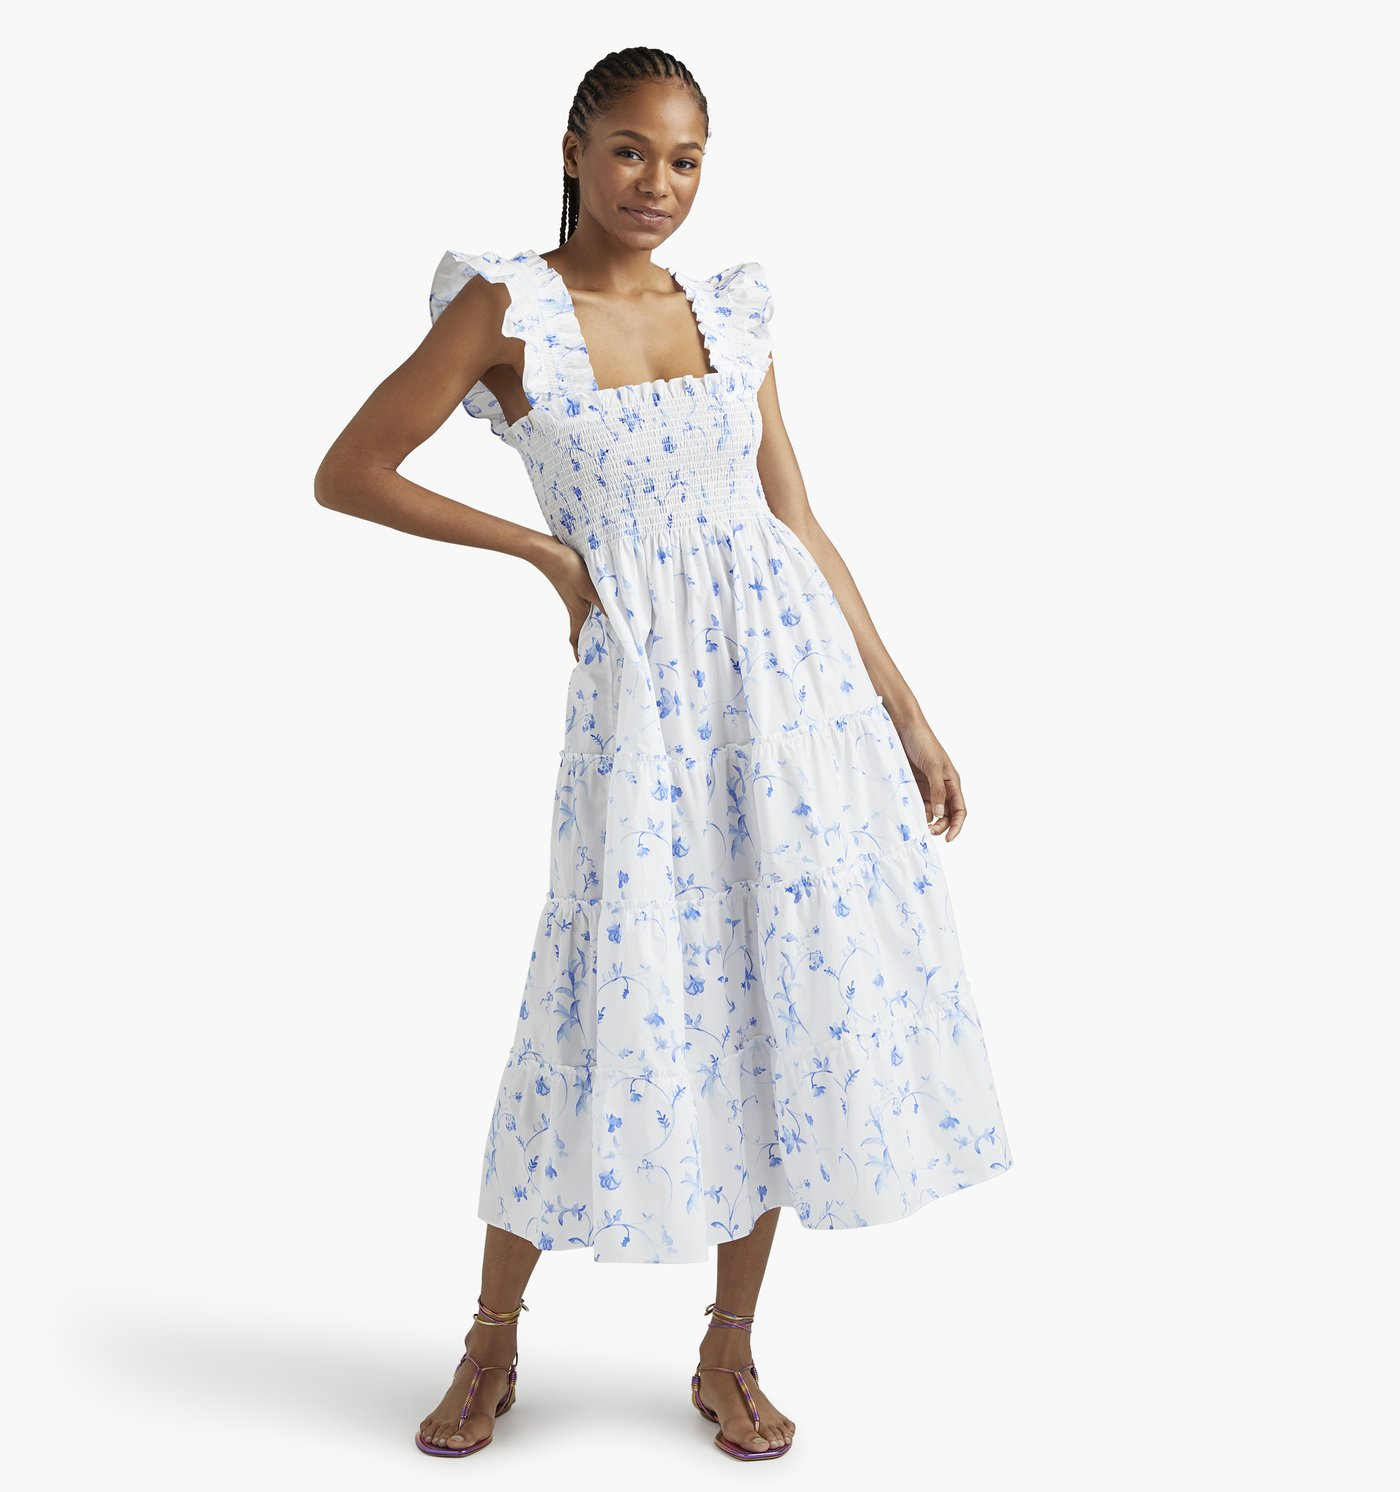 ellie nap dress new designs